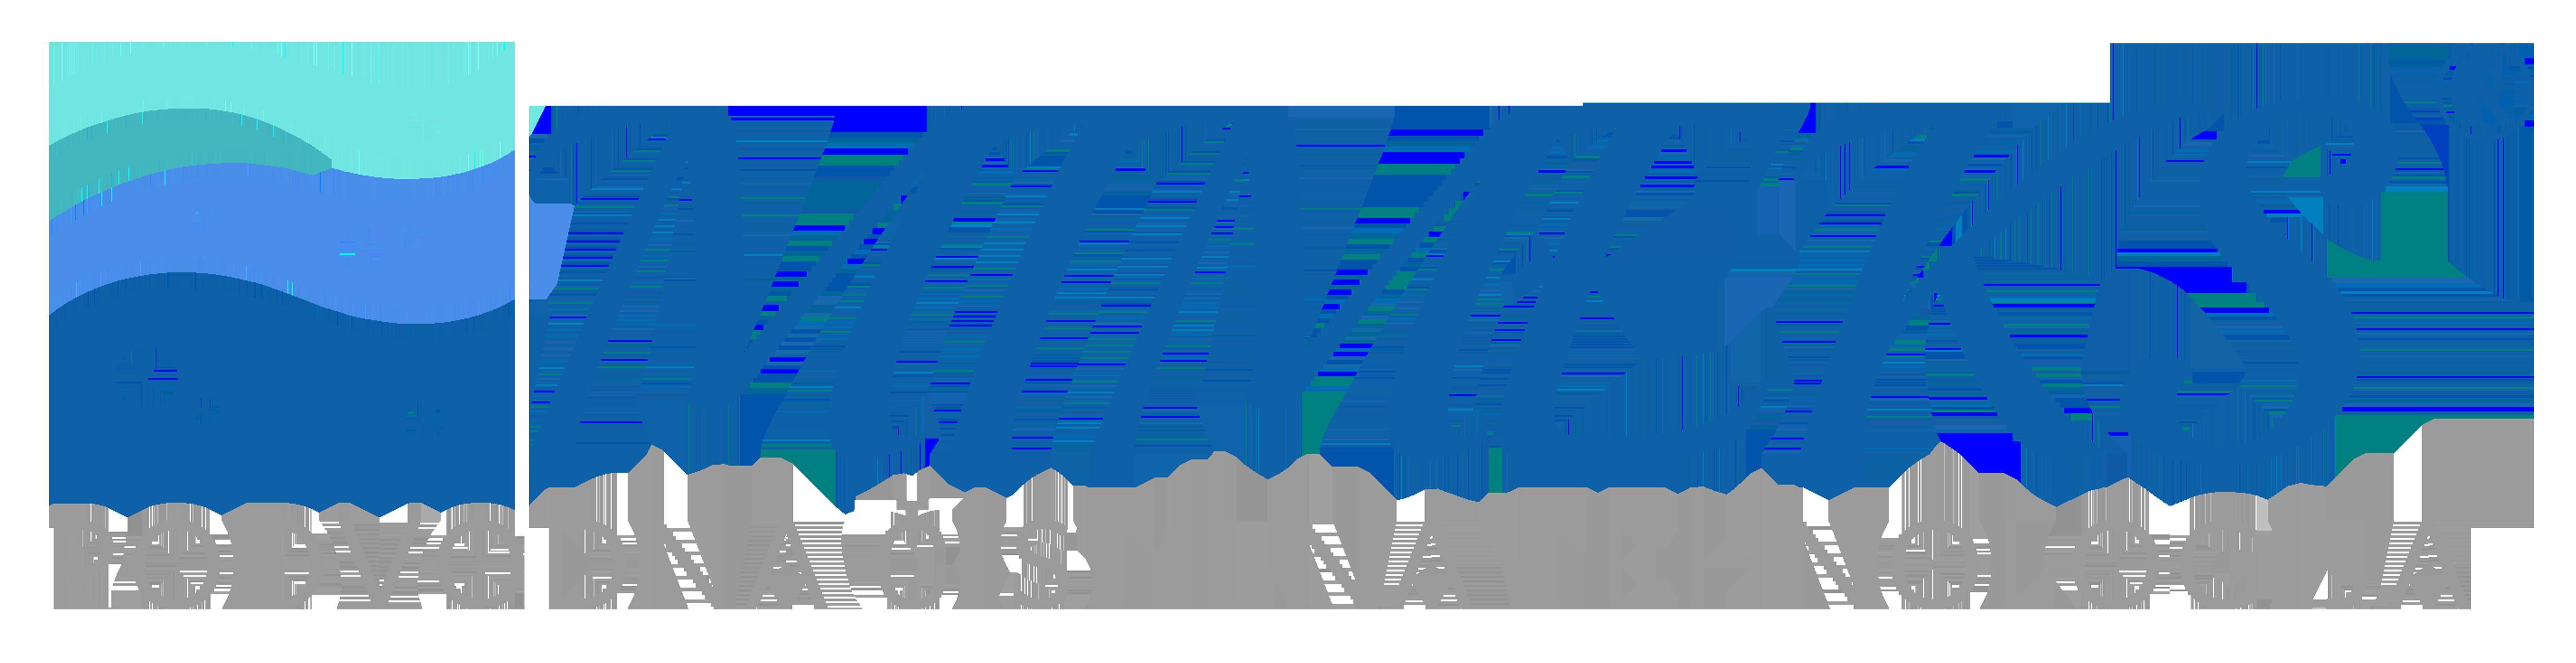 Mimeks trade